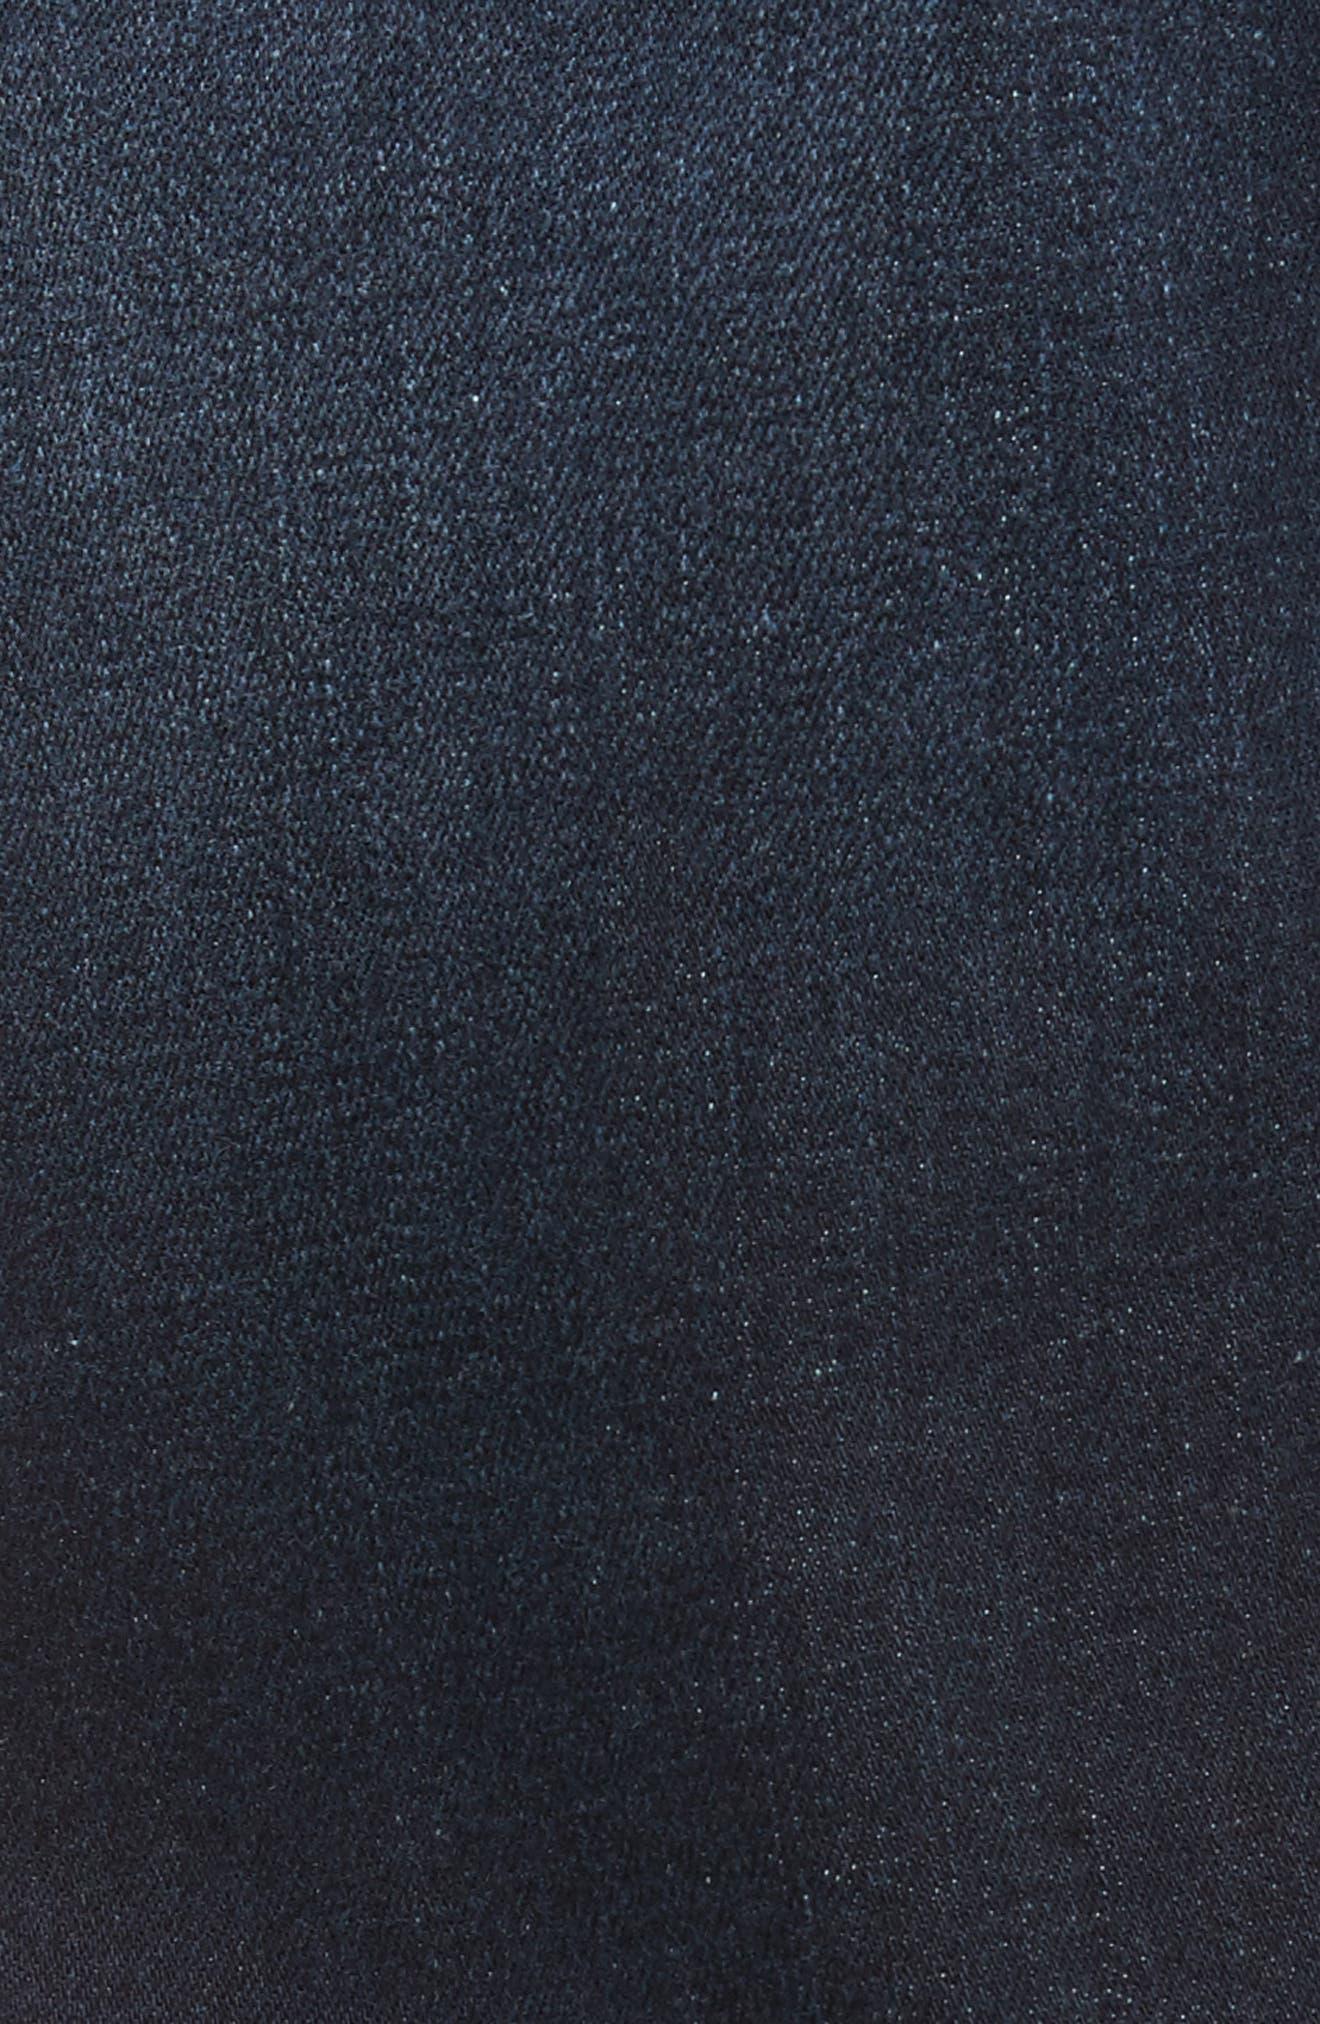 Clark Sim Straight Fit Jeans,                             Alternate thumbnail 5, color,                             Worn Dark Blue